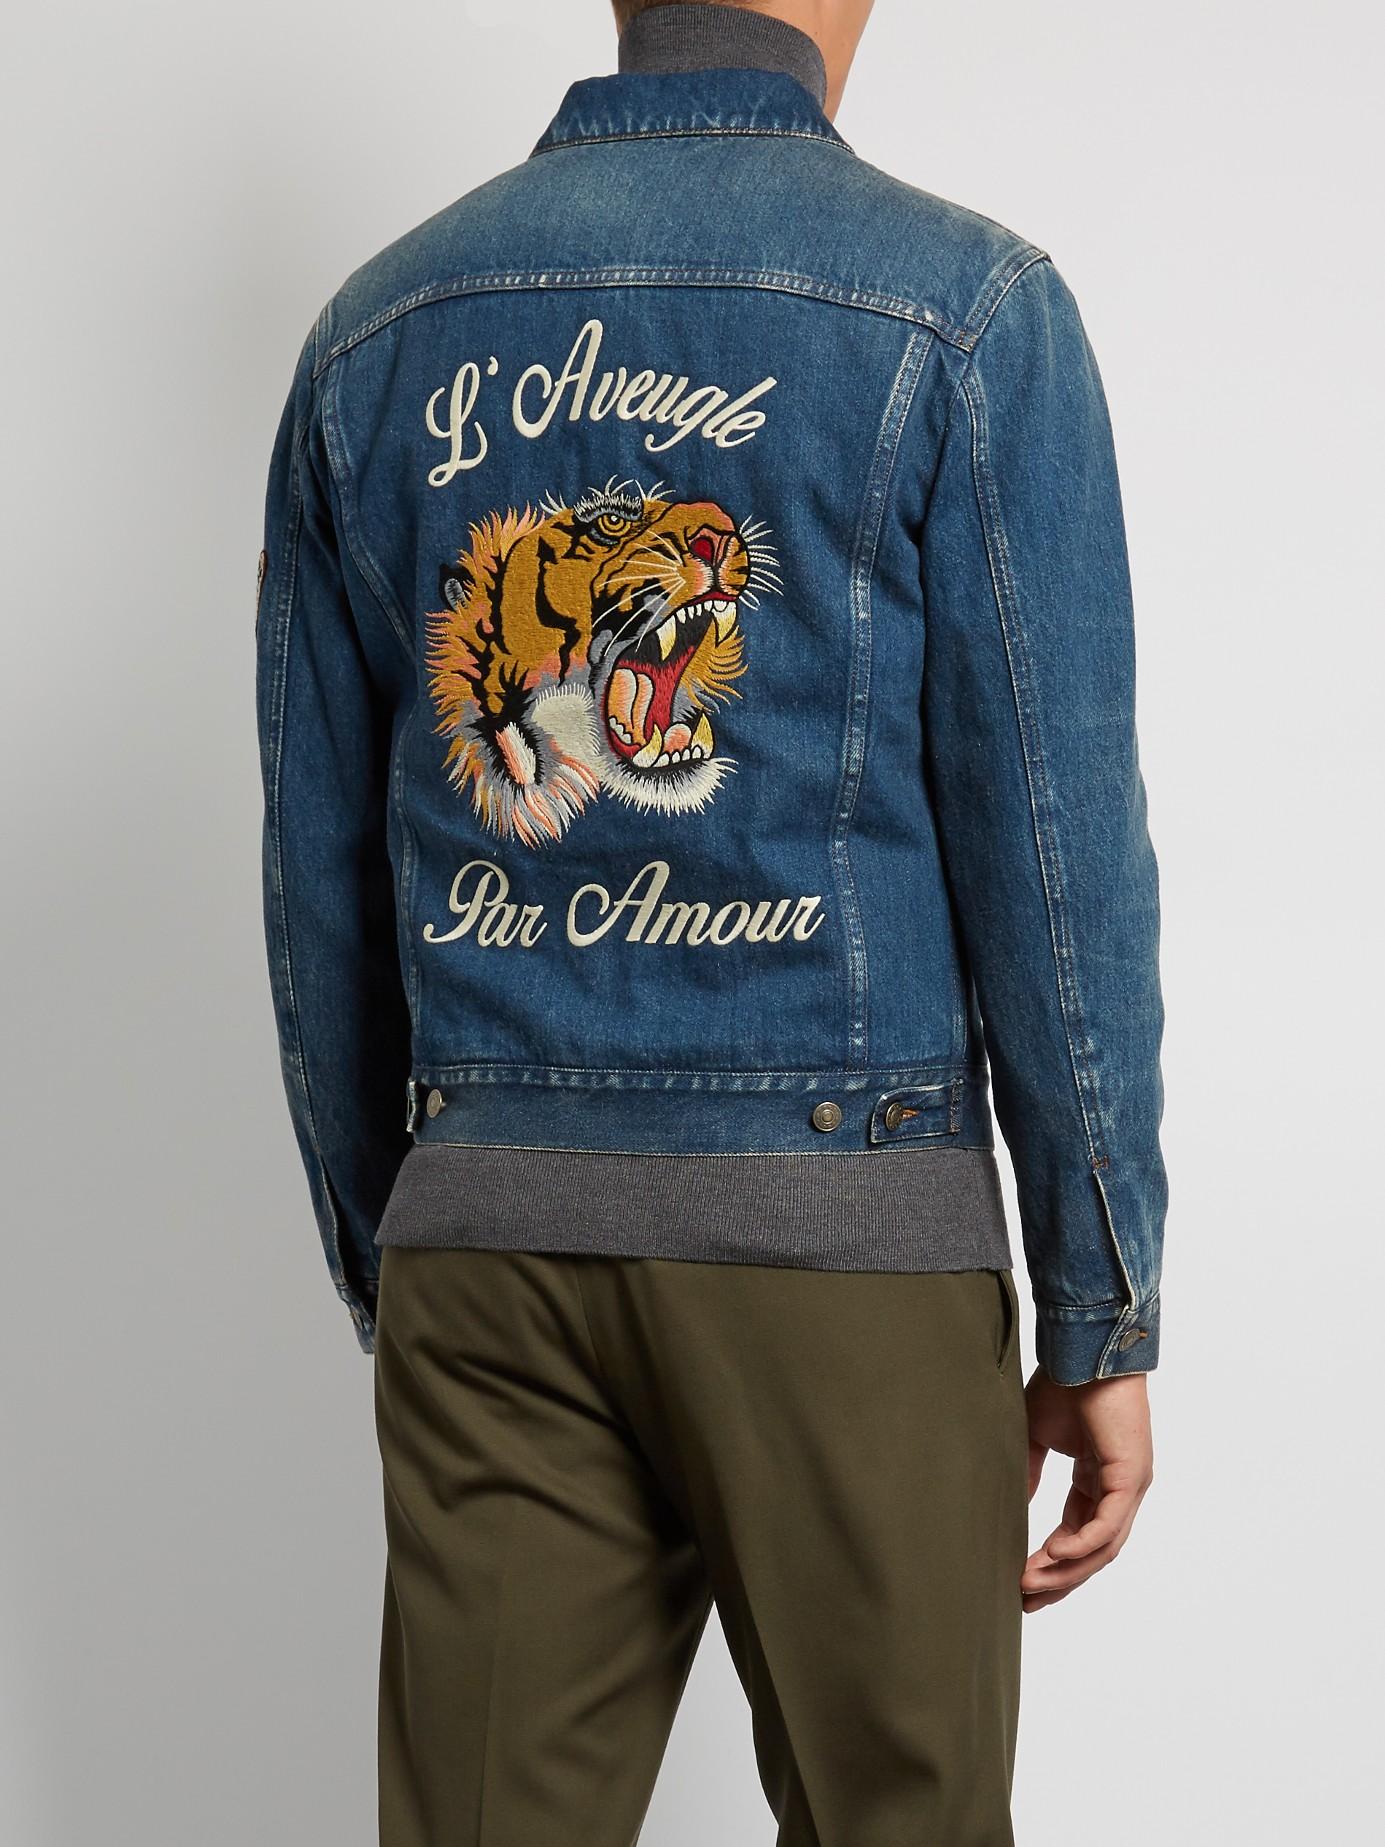 38b18b314 Gucci Gucci Tiger-embroidered Denim Jacket   Grailed